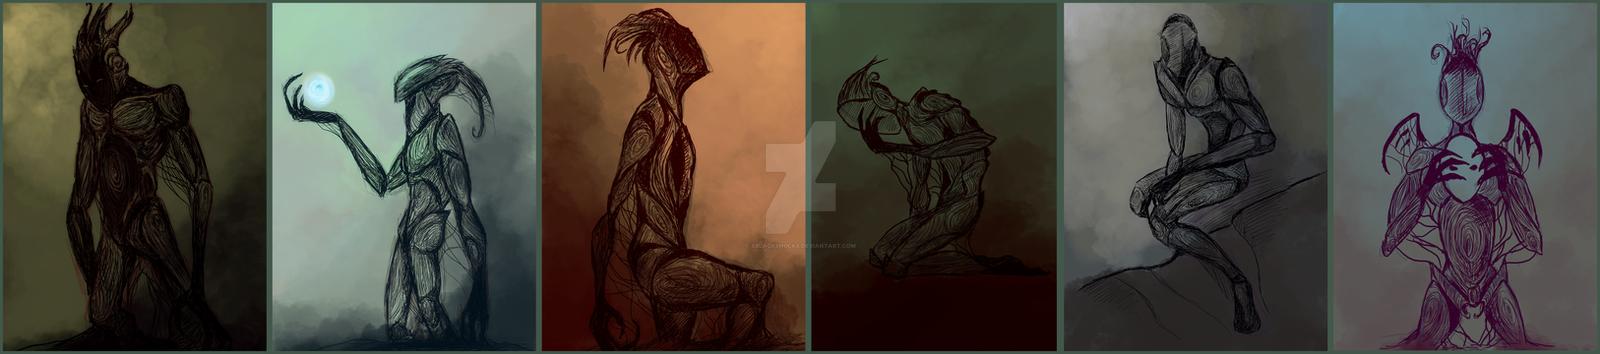 Emotions through Ink Minor by XBlackShuckX